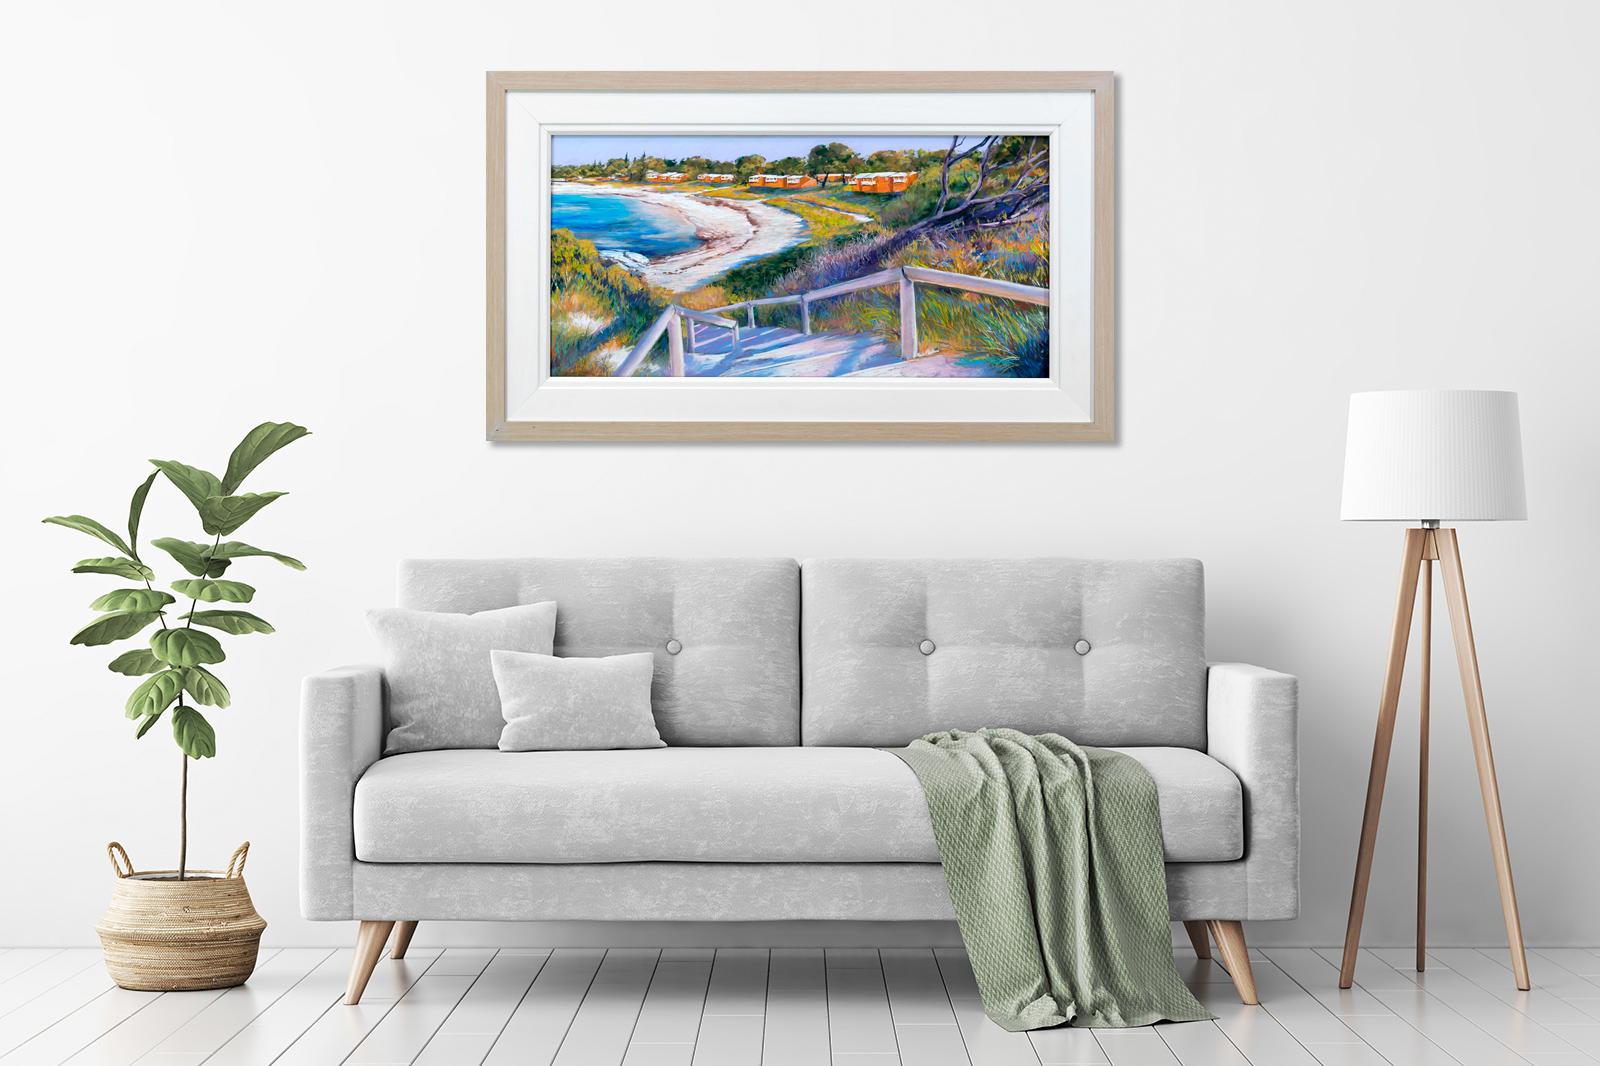 Thomson Bay, Bathurst End Framed in a room